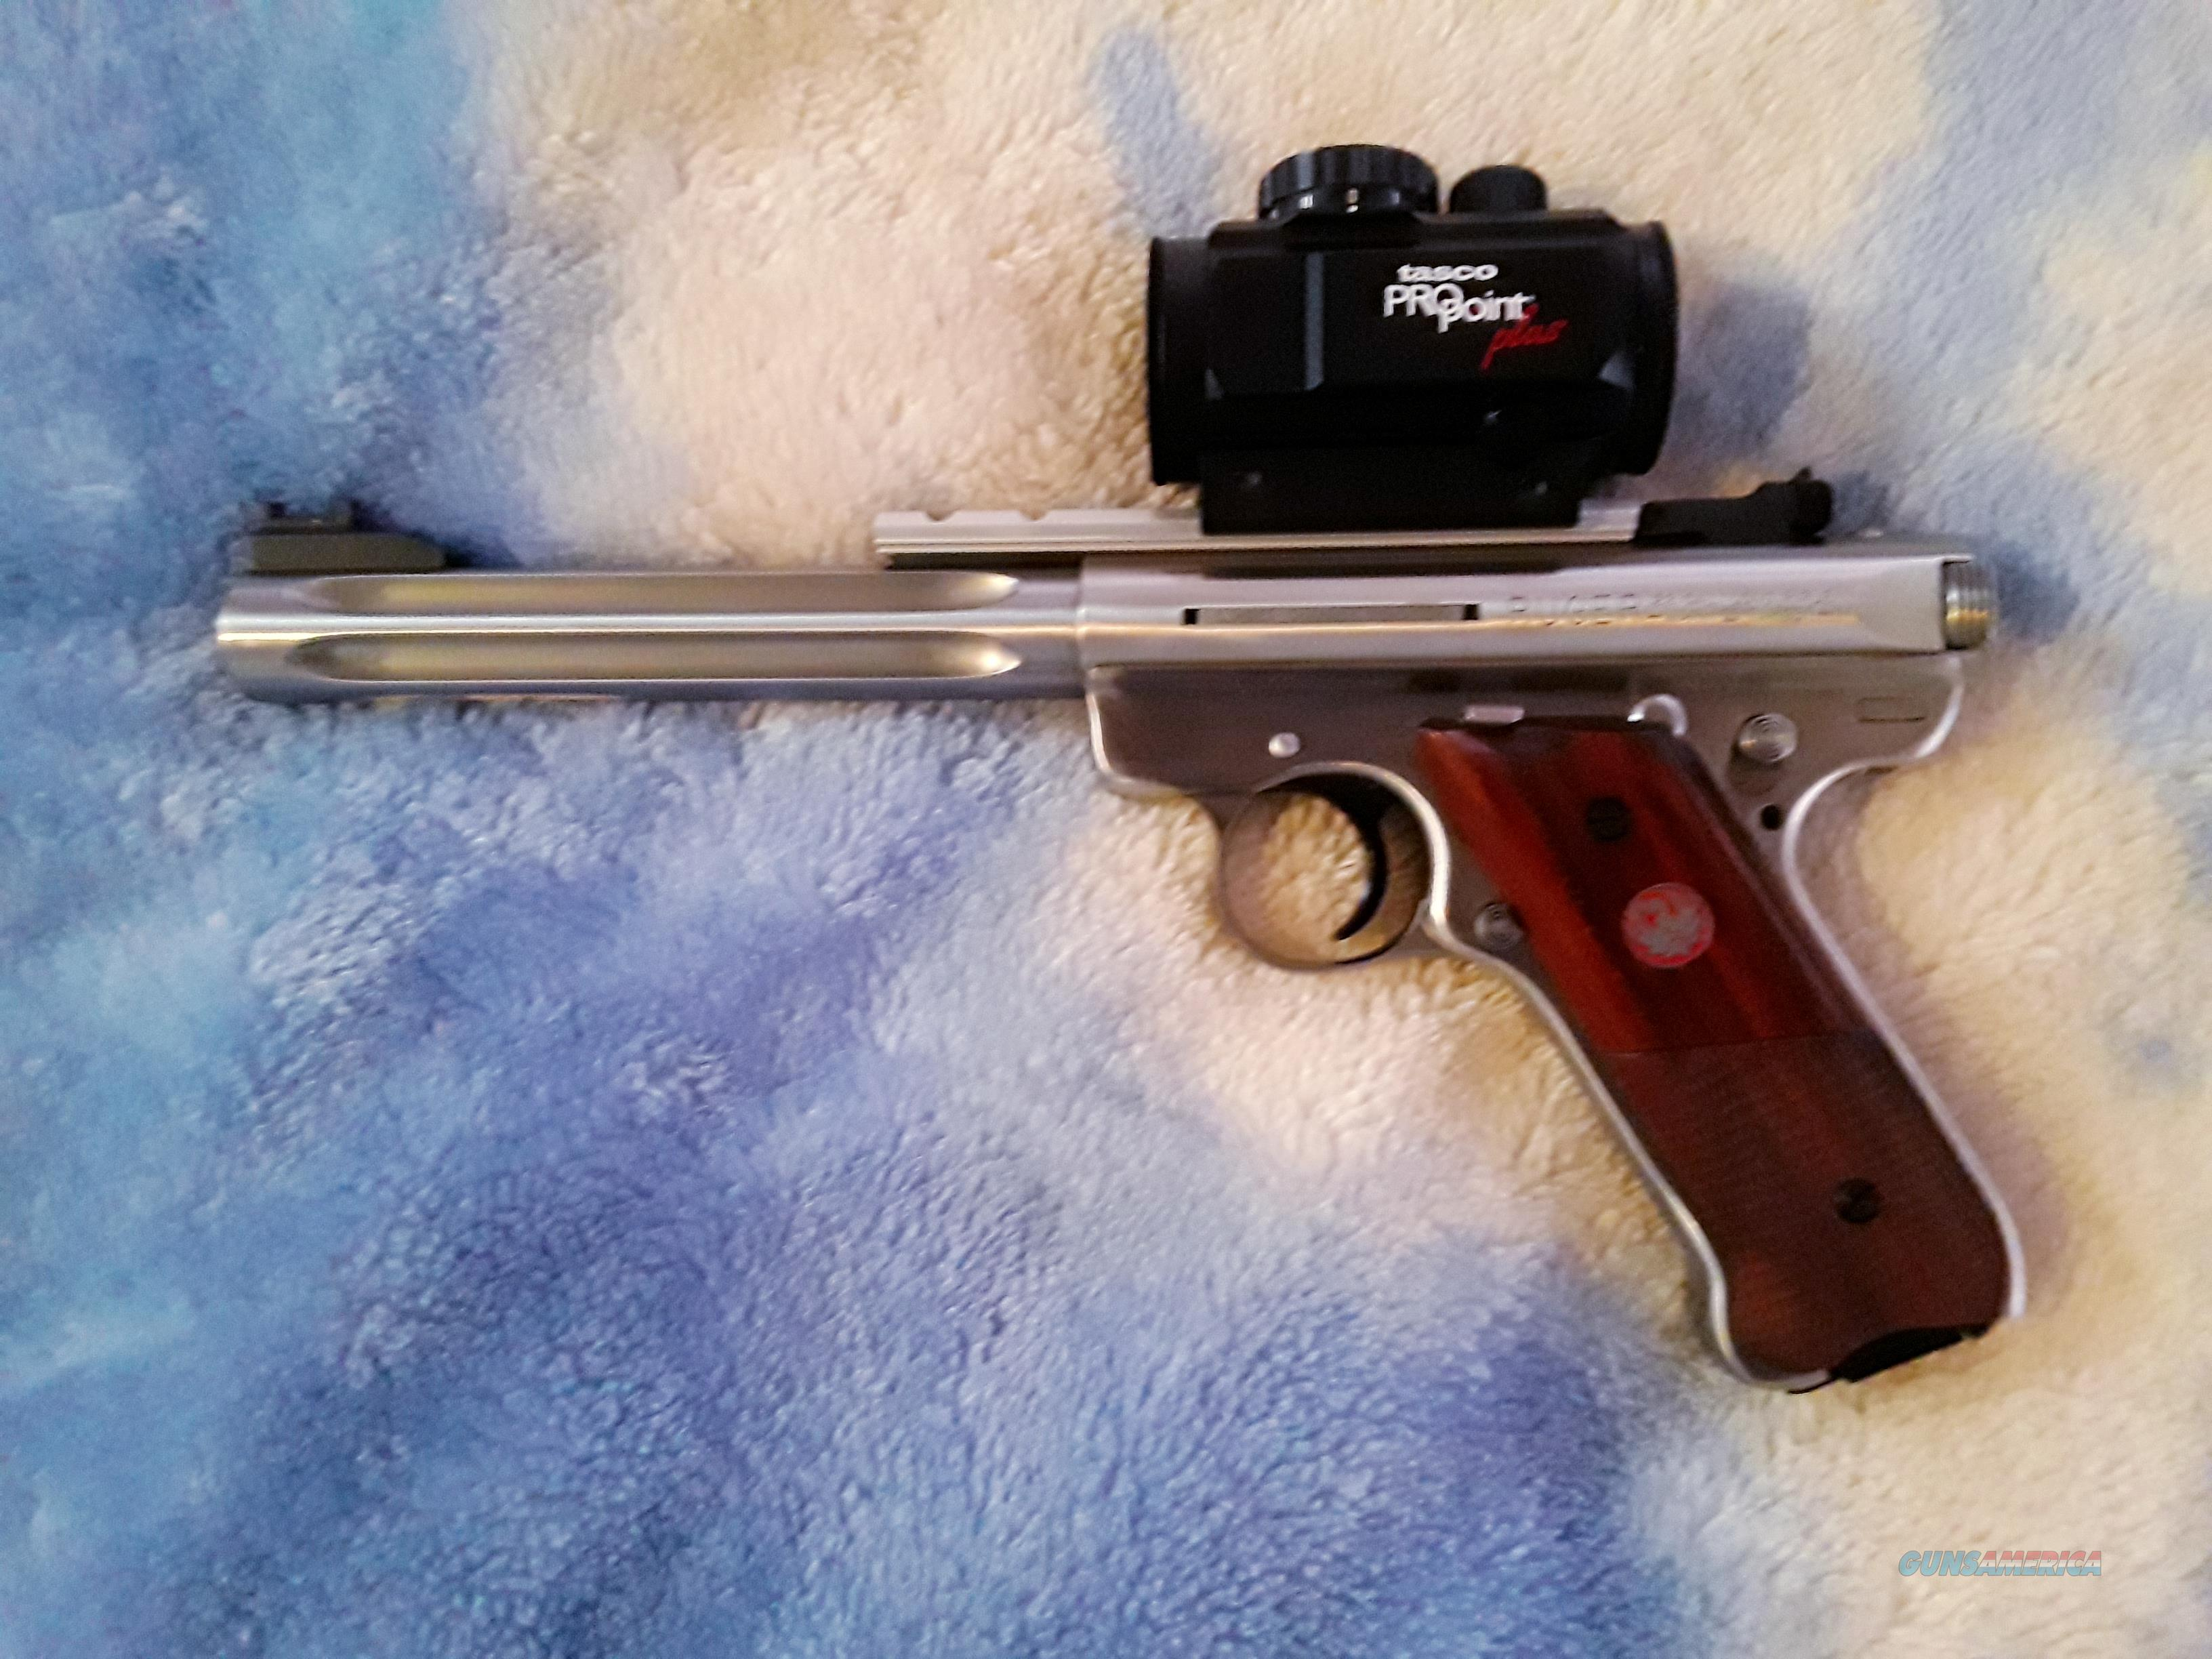 Mark III Hunter model in like new condition   Guns > Pistols > Ruger Semi-Auto Pistols > Mark I/II/III/IV Family